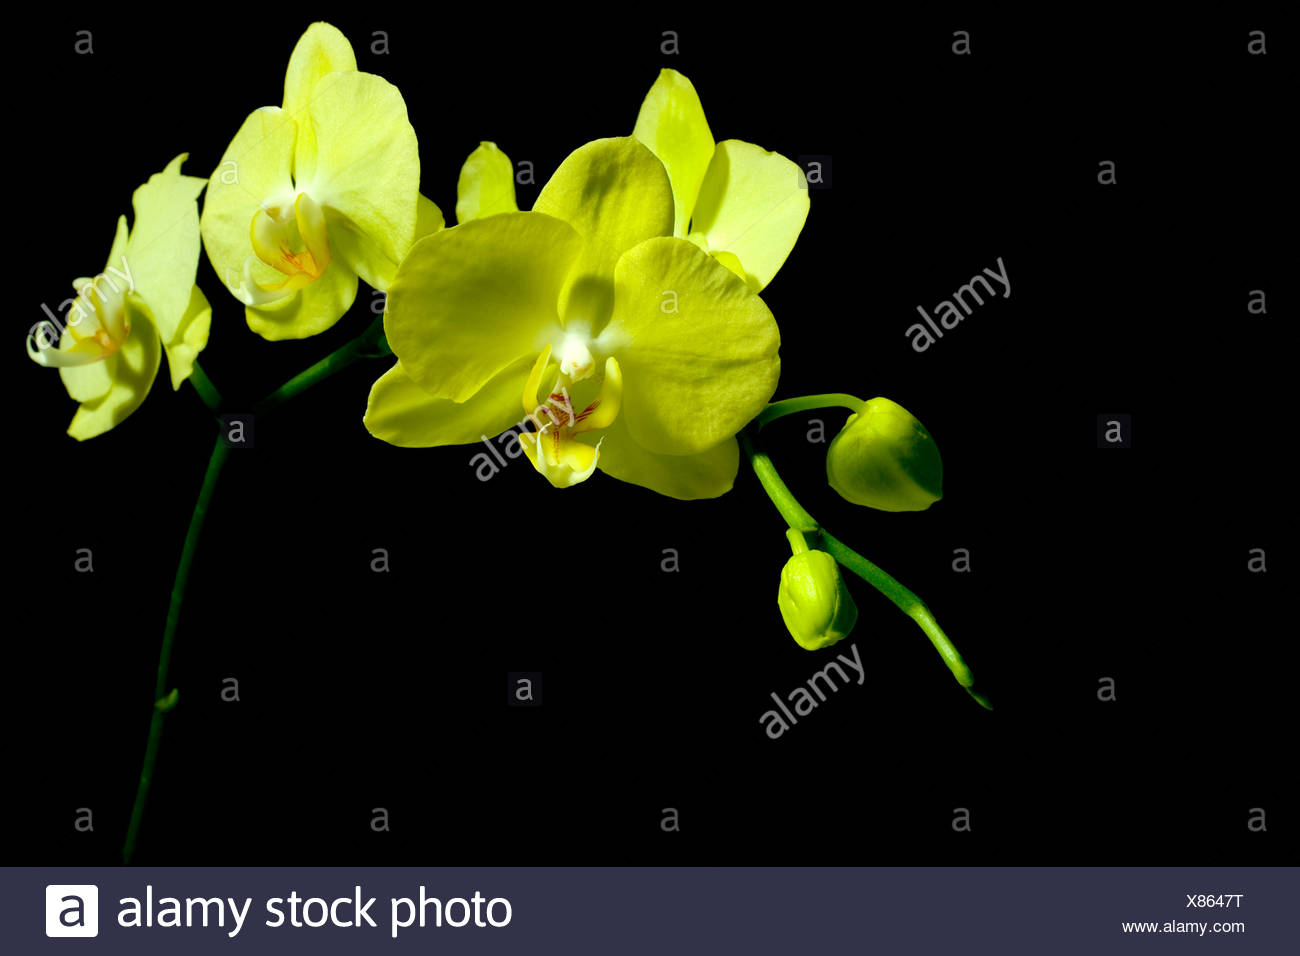 Yellow flowers on black background Stock Photo